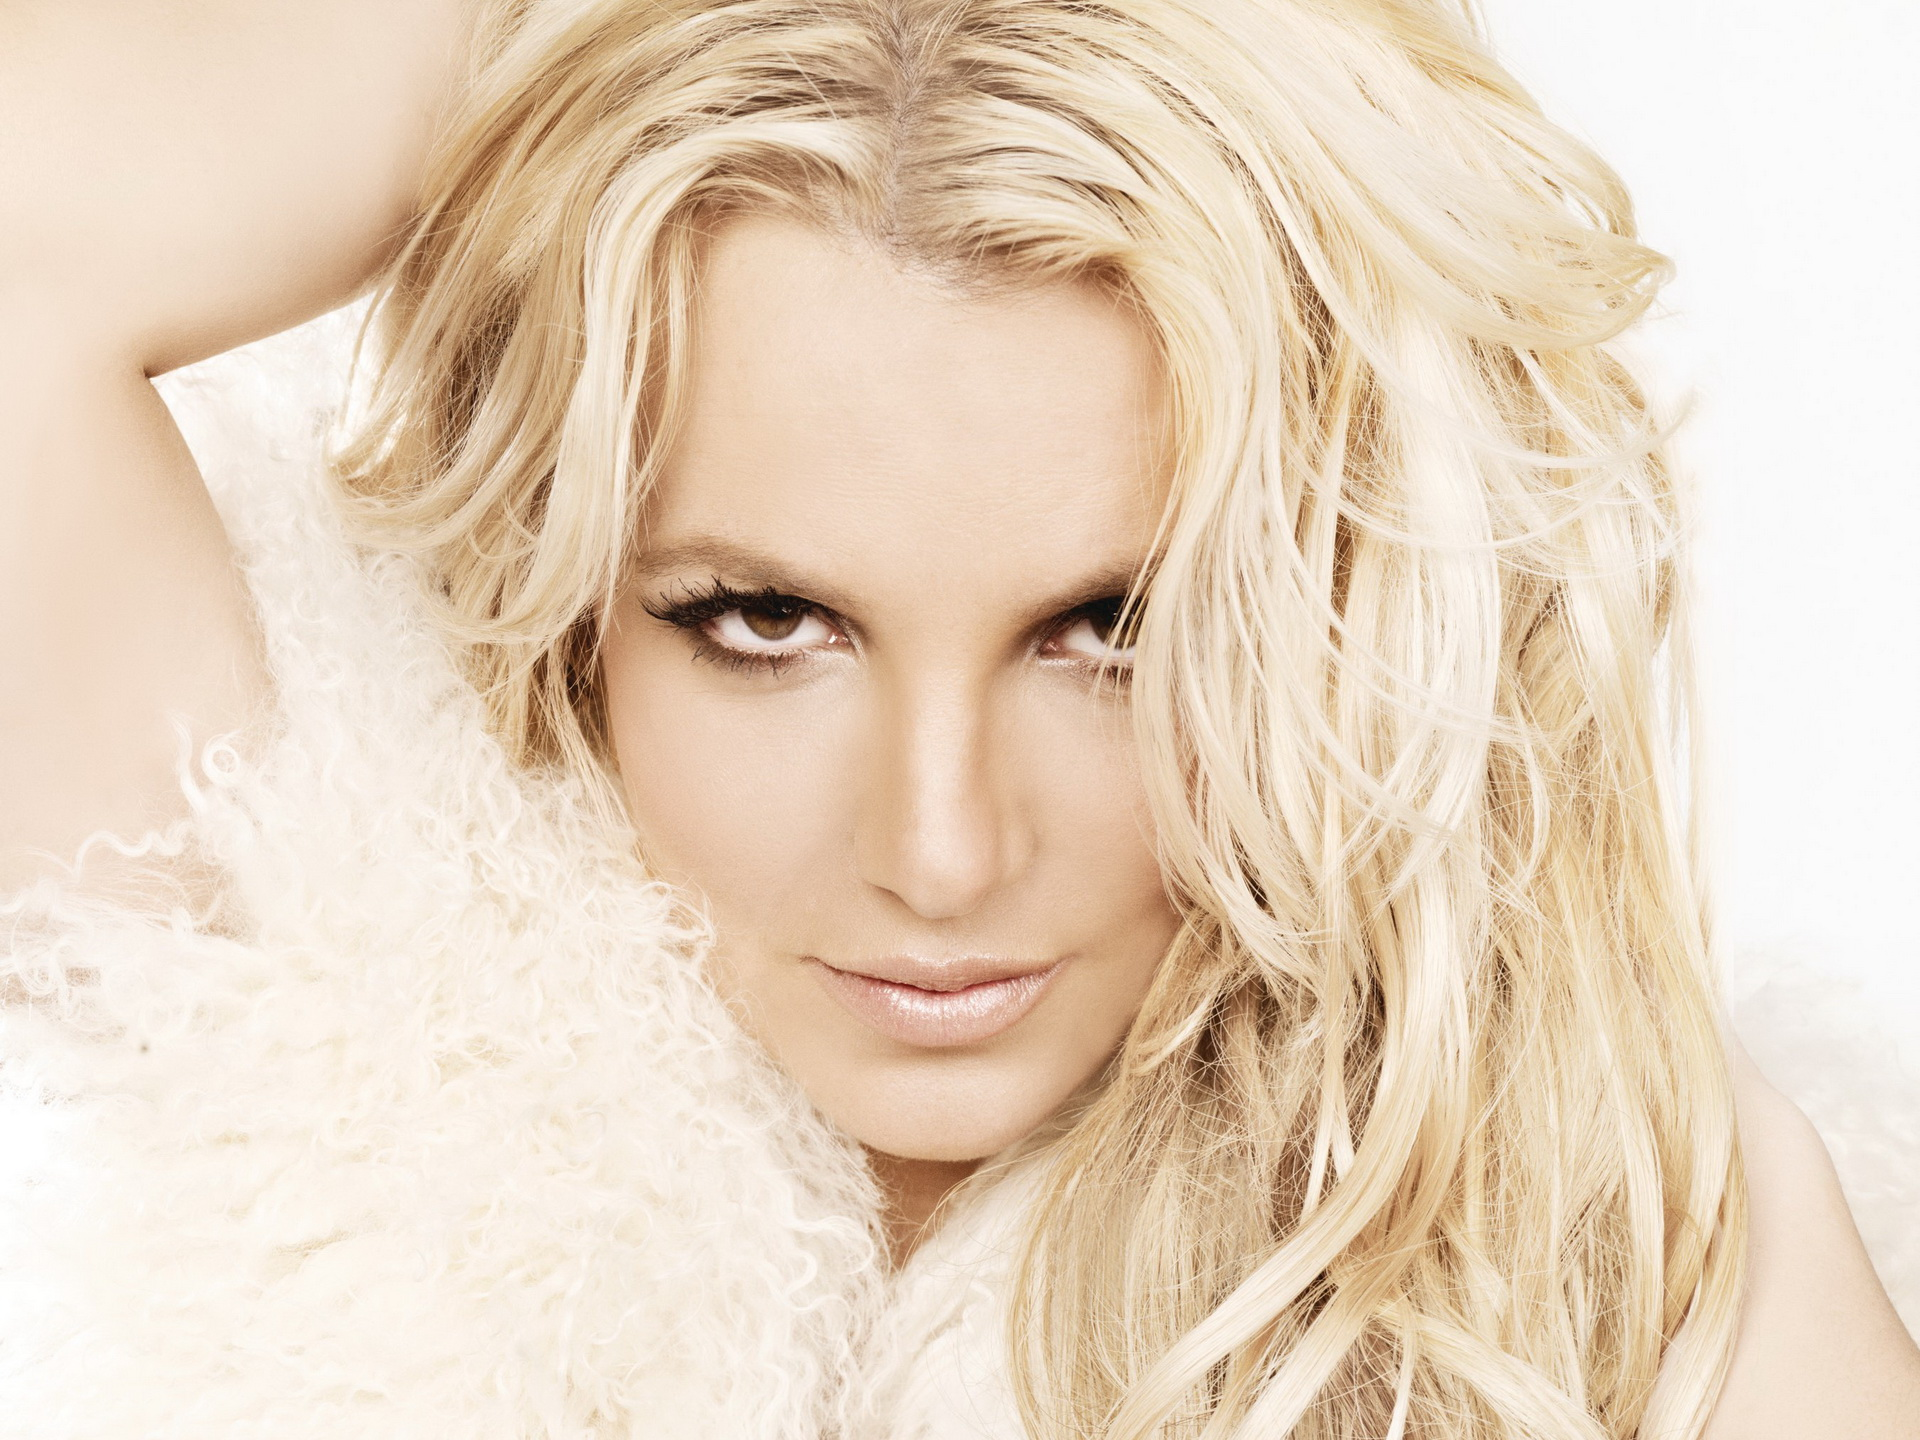 Britney Spears Wallpaper 2116